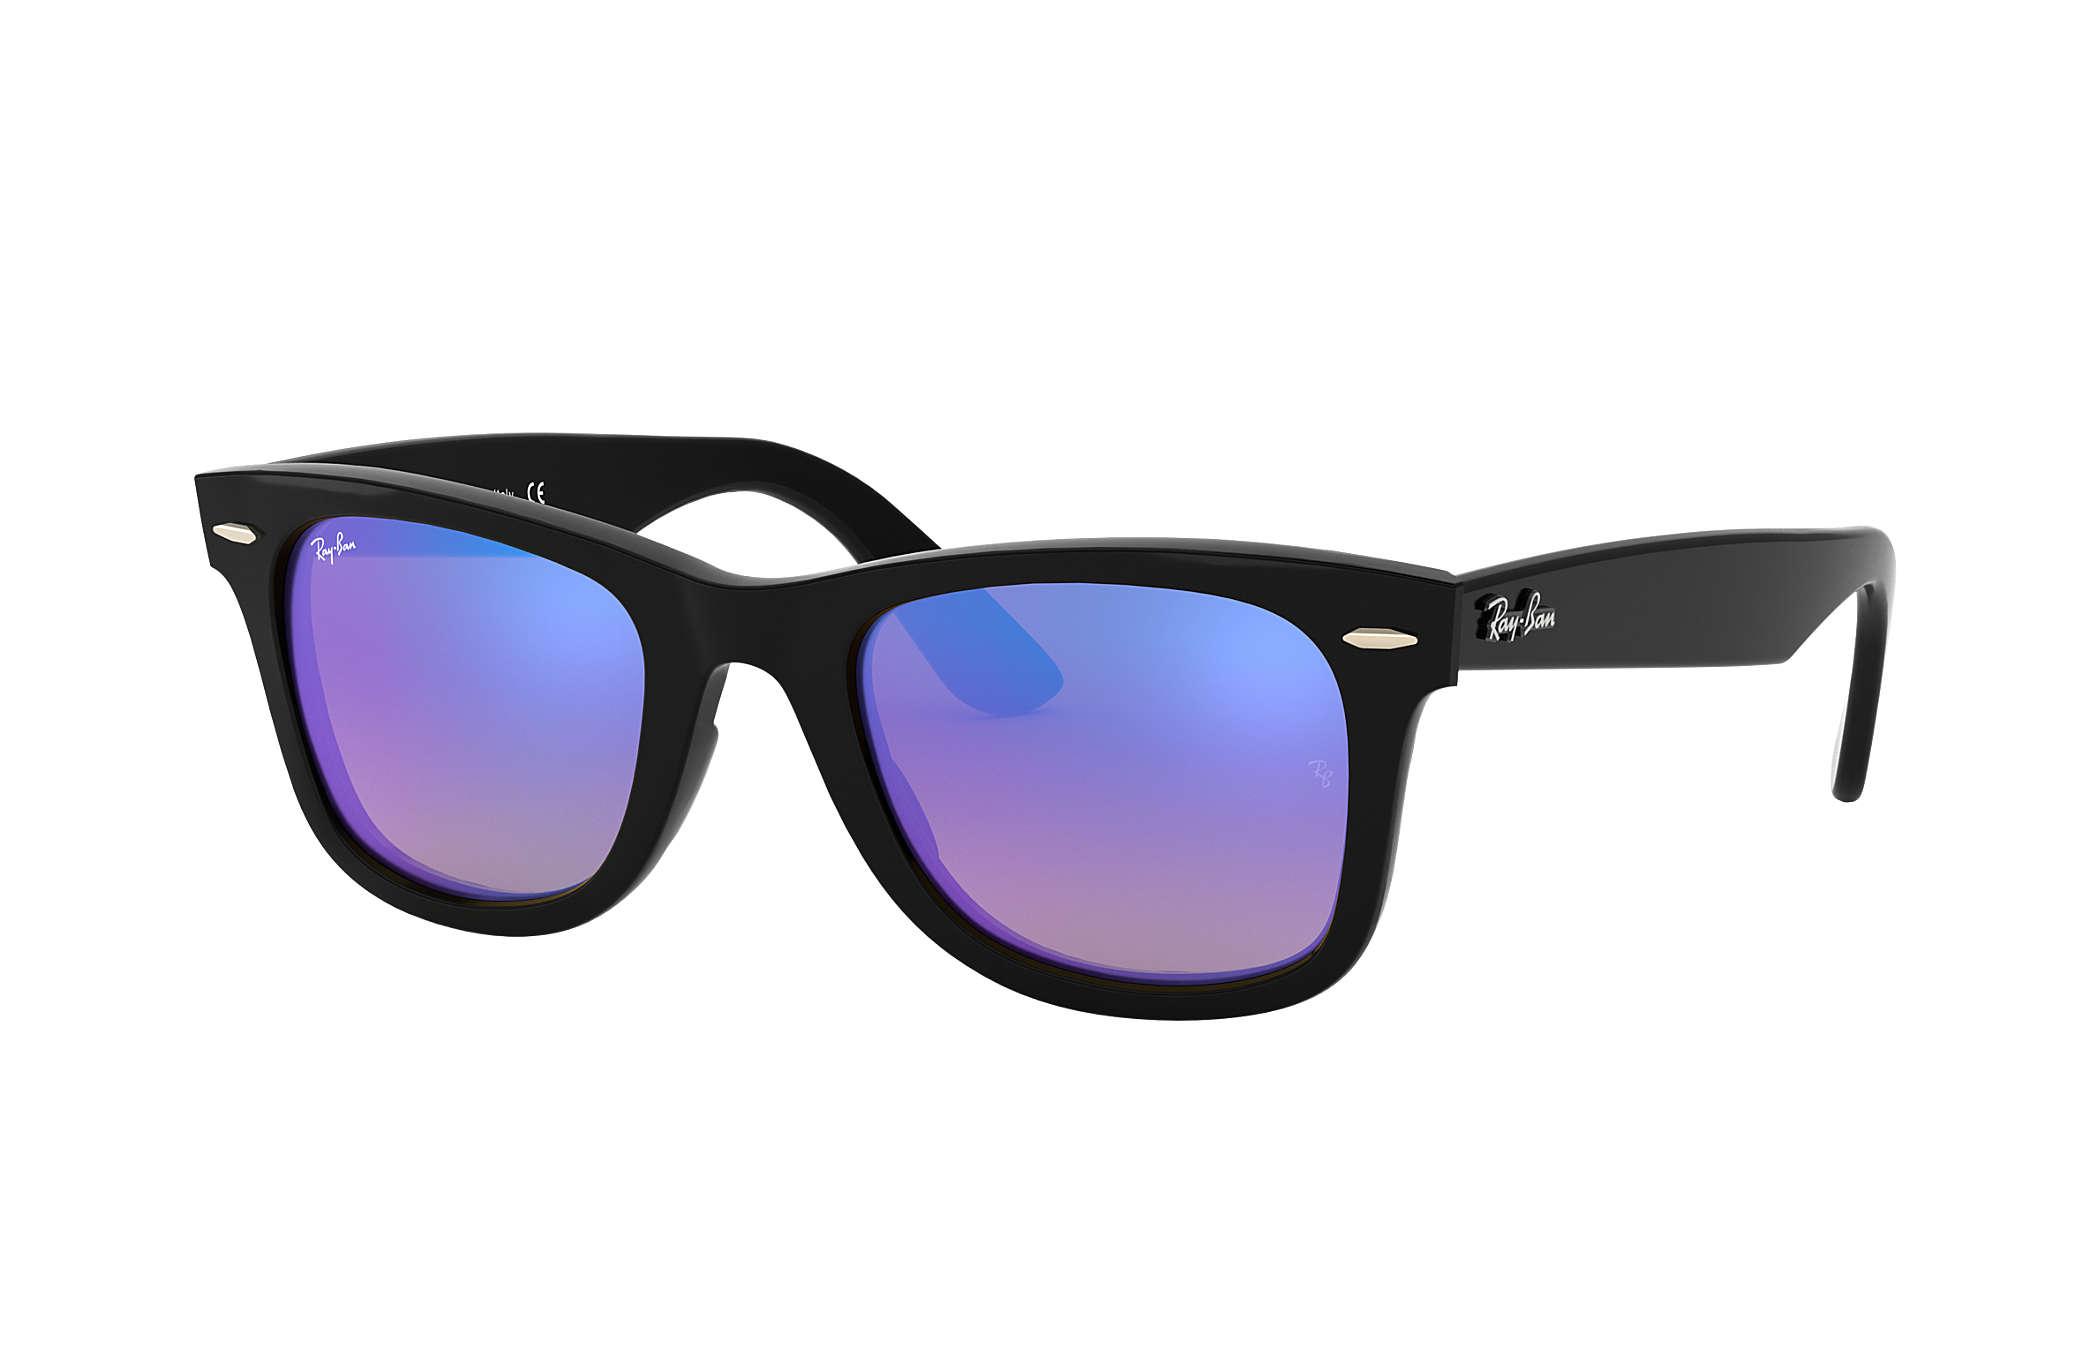 779bfd51b Ray-Ban Wayfarer Ease RB4340 Black - Injected - Blue Lenses ...